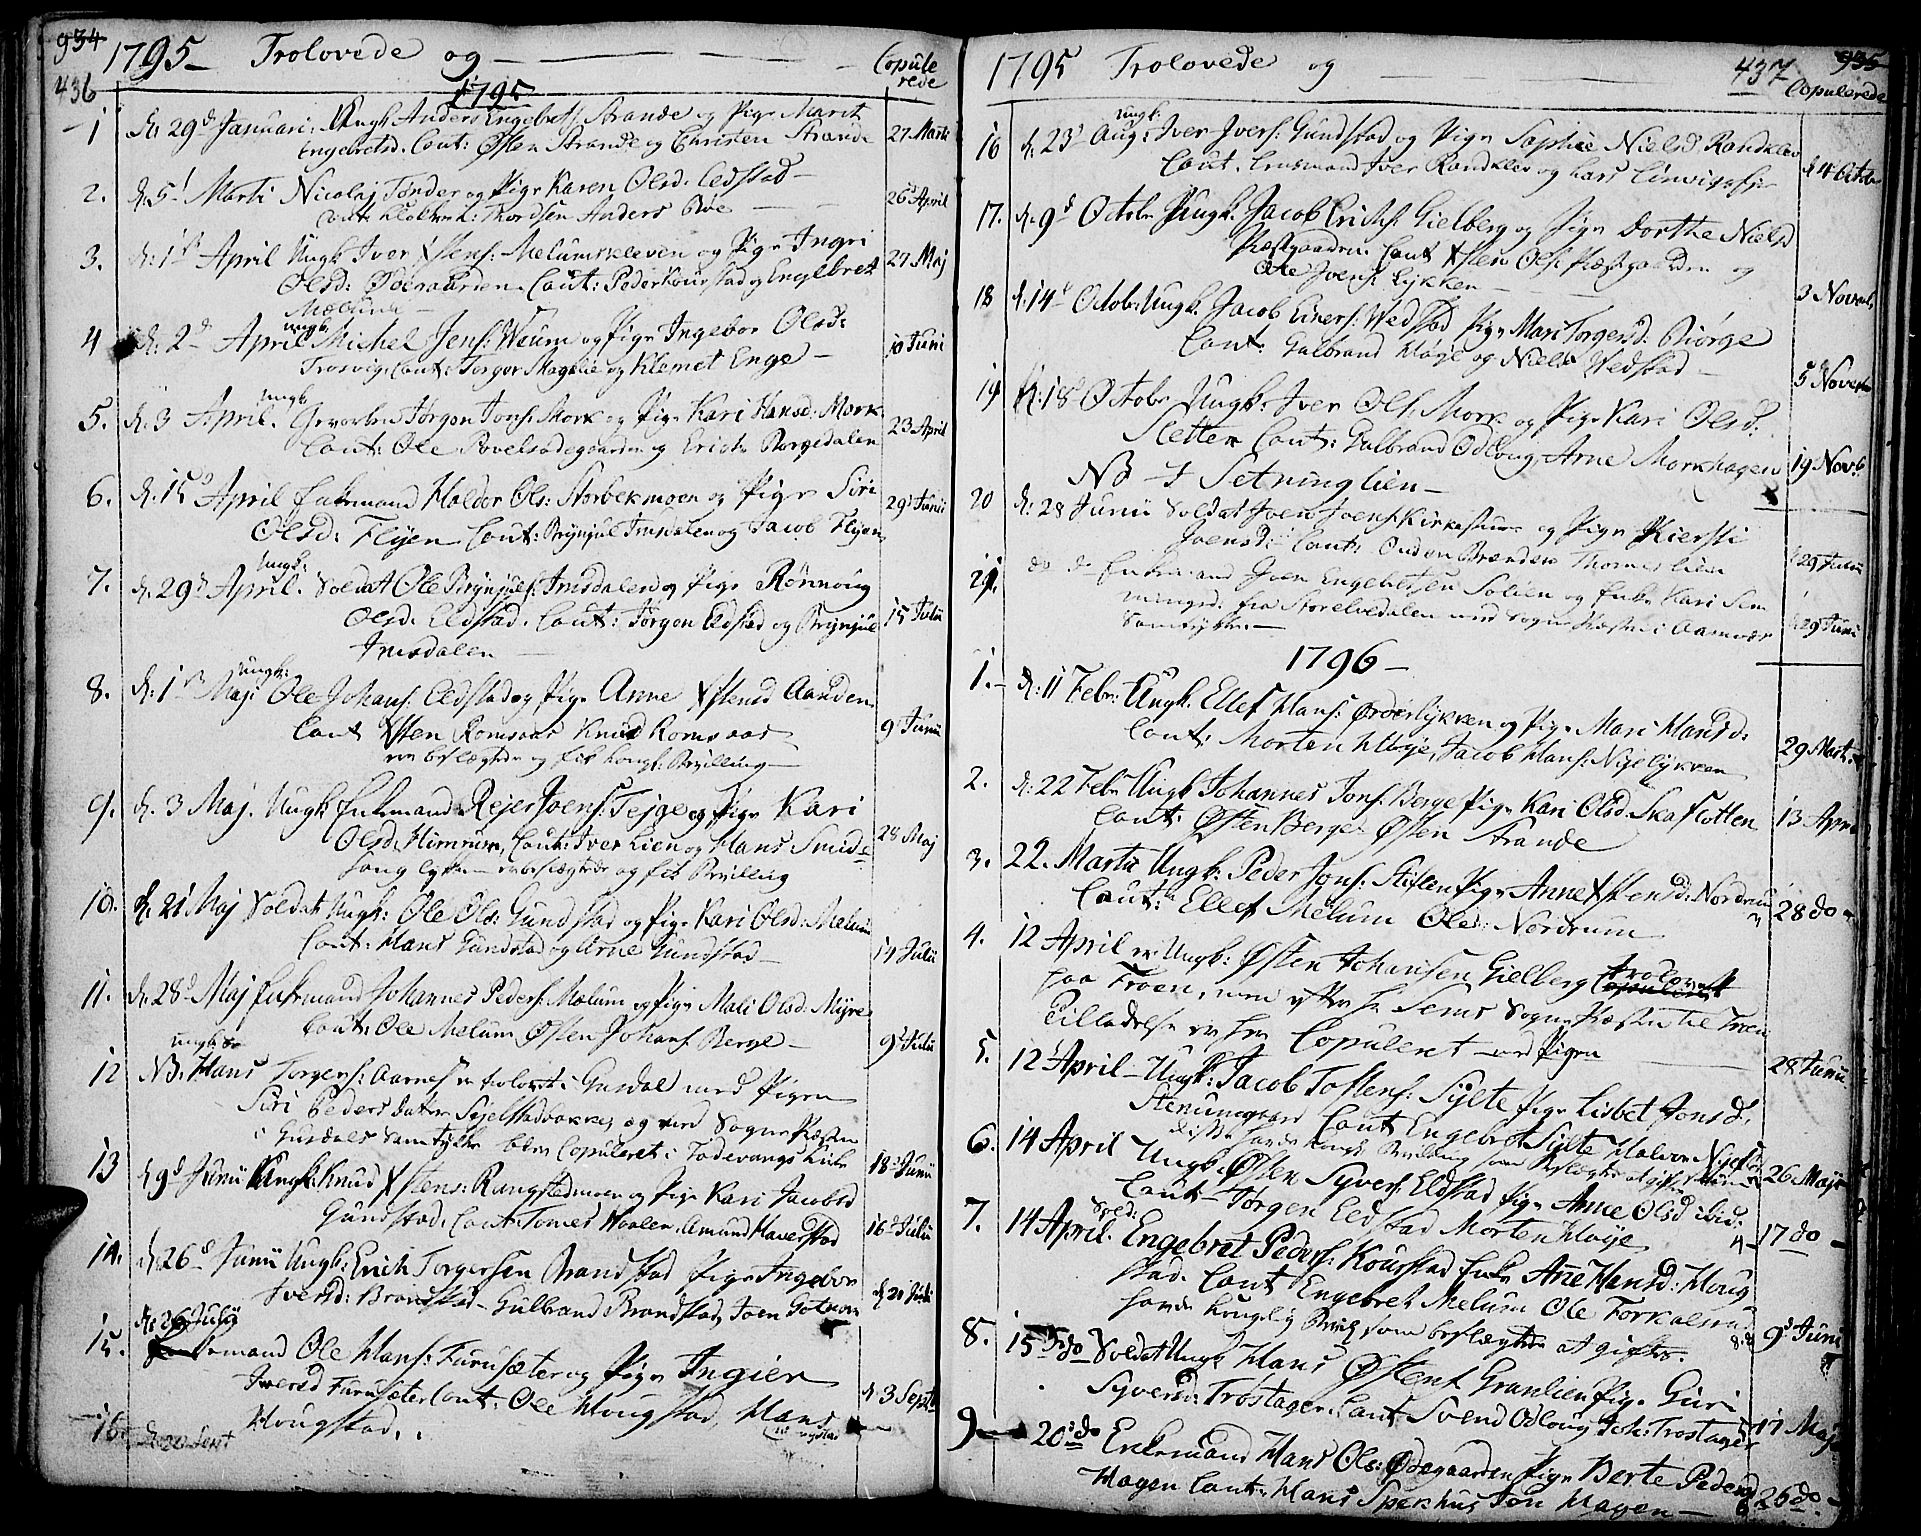 SAH, Ringebu prestekontor, Ministerialbok nr. 3, 1781-1820, s. 436-437